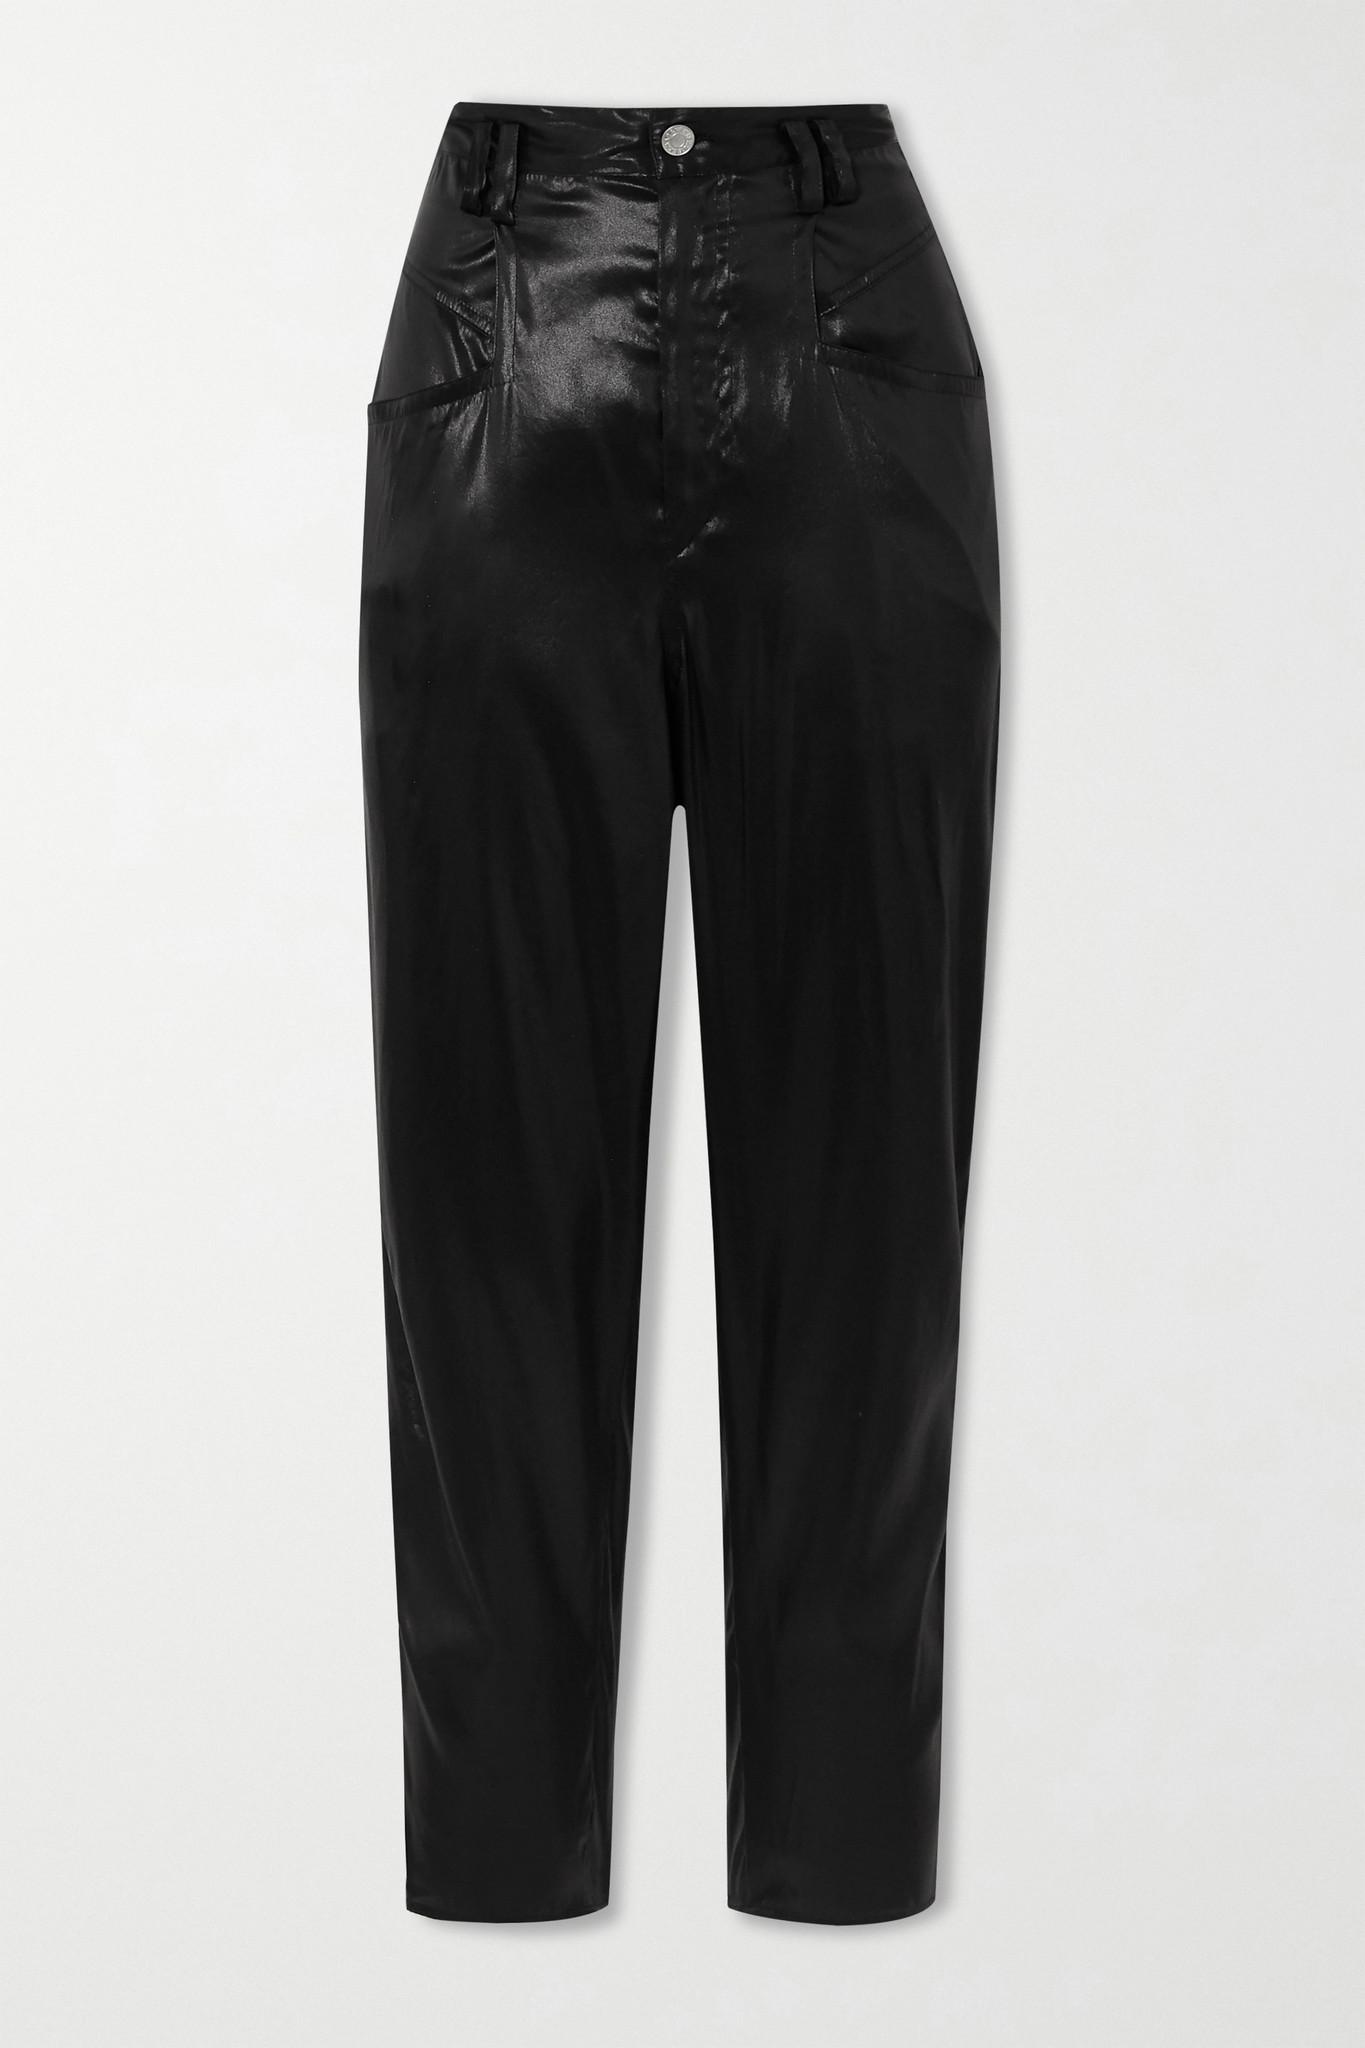 ISABEL MARANT - Oversized Silk-satin Tapered Pants - Black - FR36